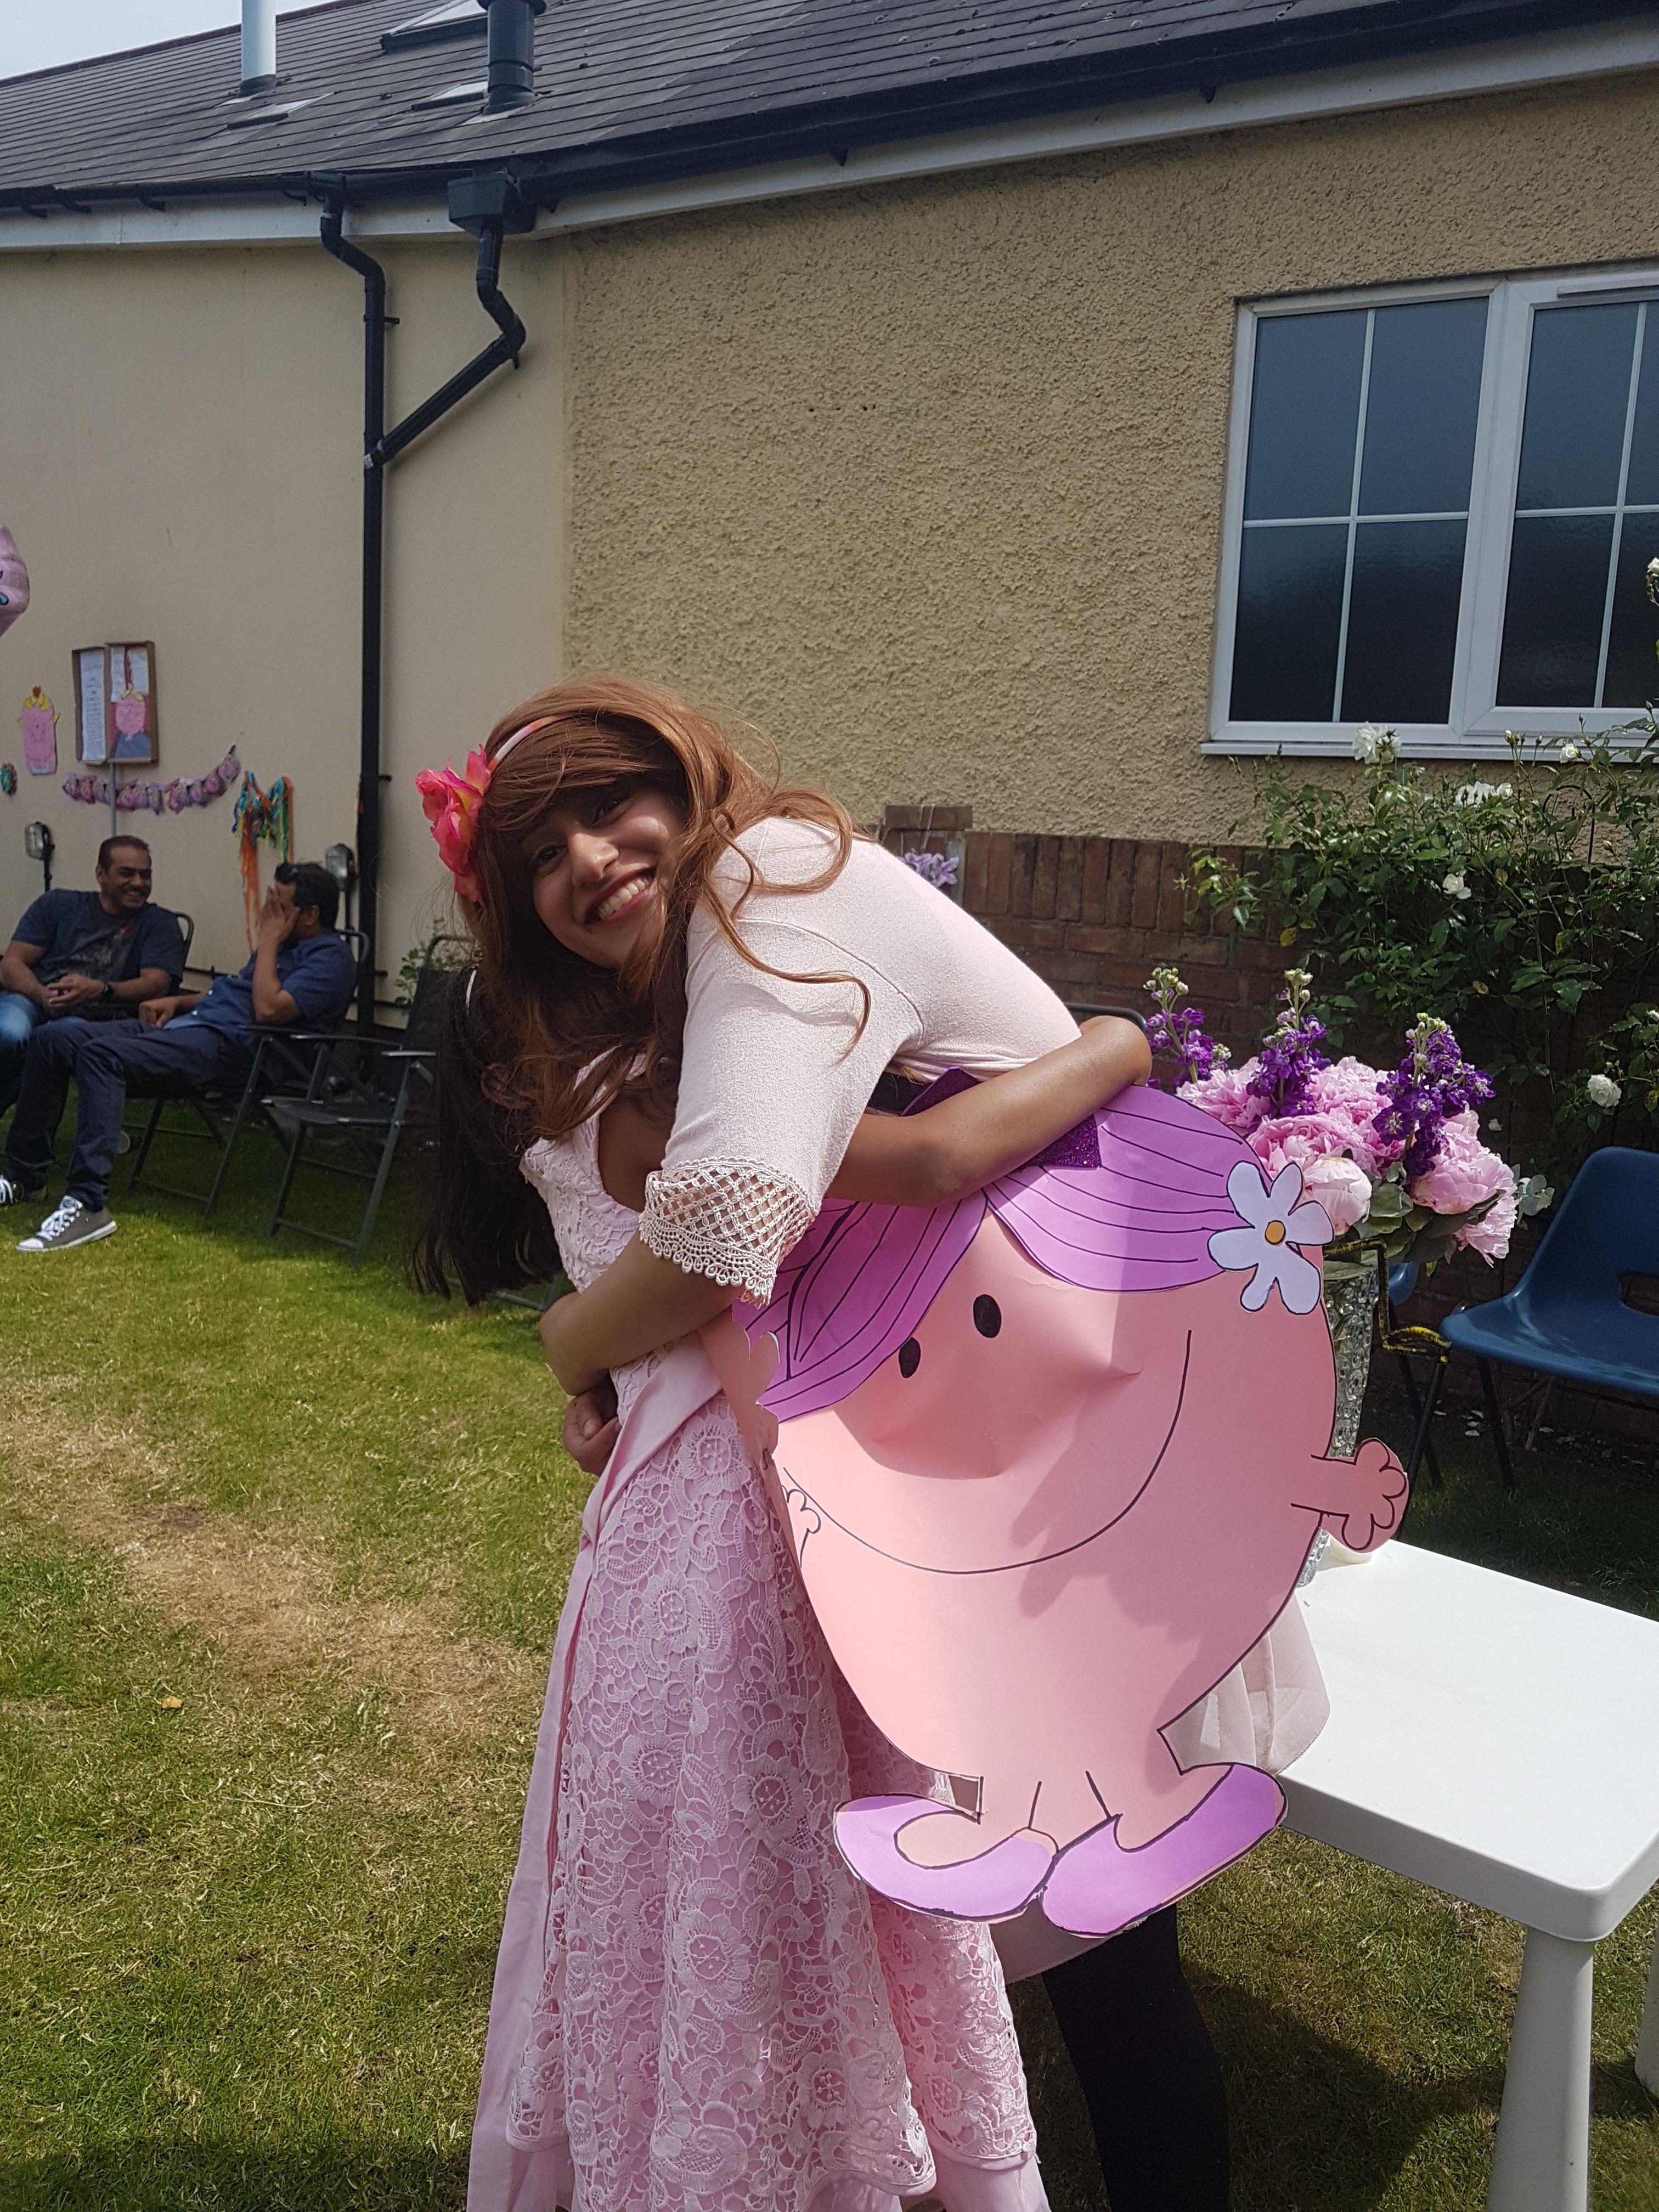 Little Miss Hug Diy Costume Book Week Costume Diy Costumes Book Character Day